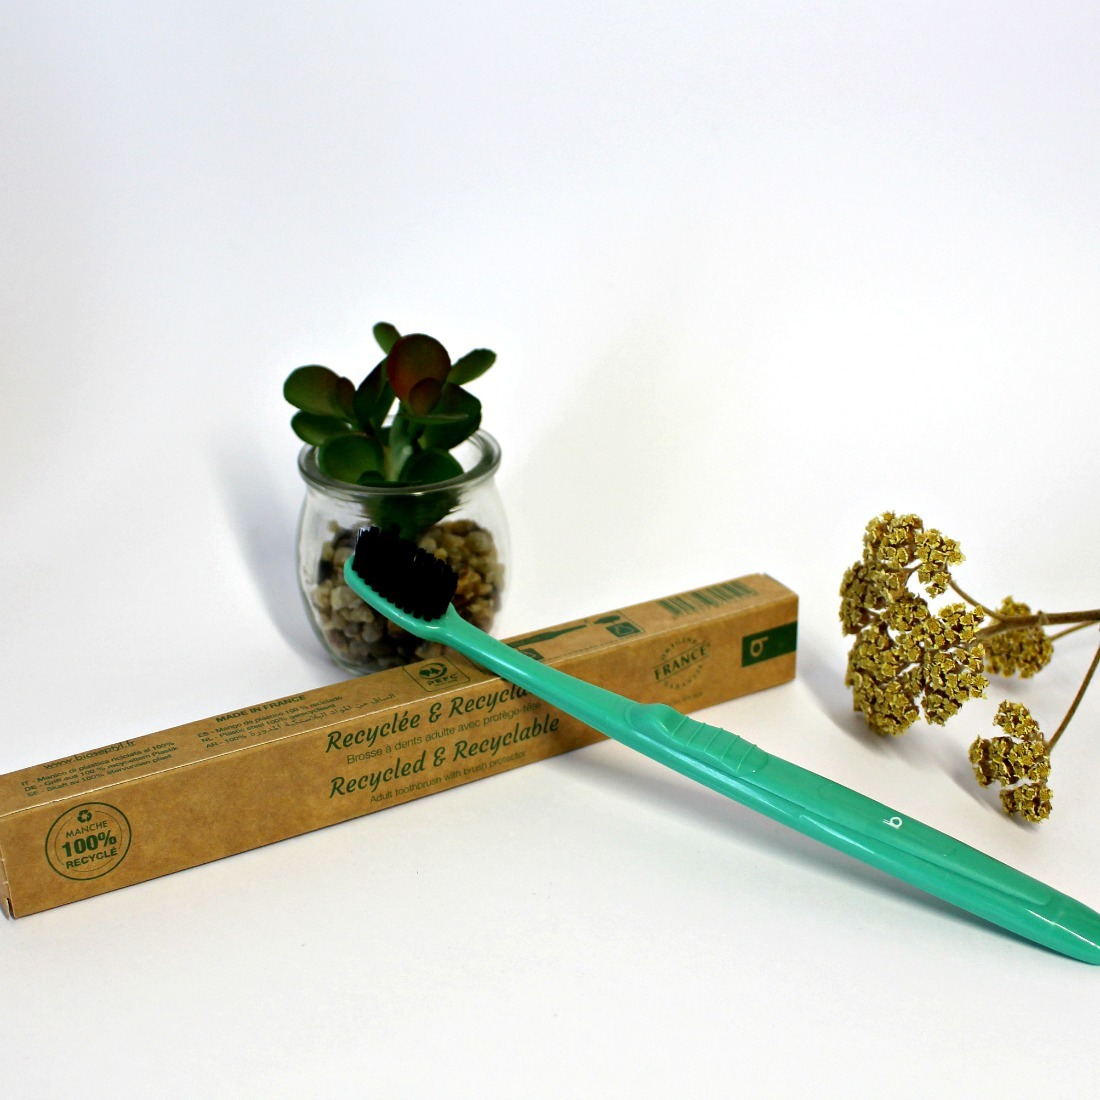 brosse à dents bioseptyl recyclable